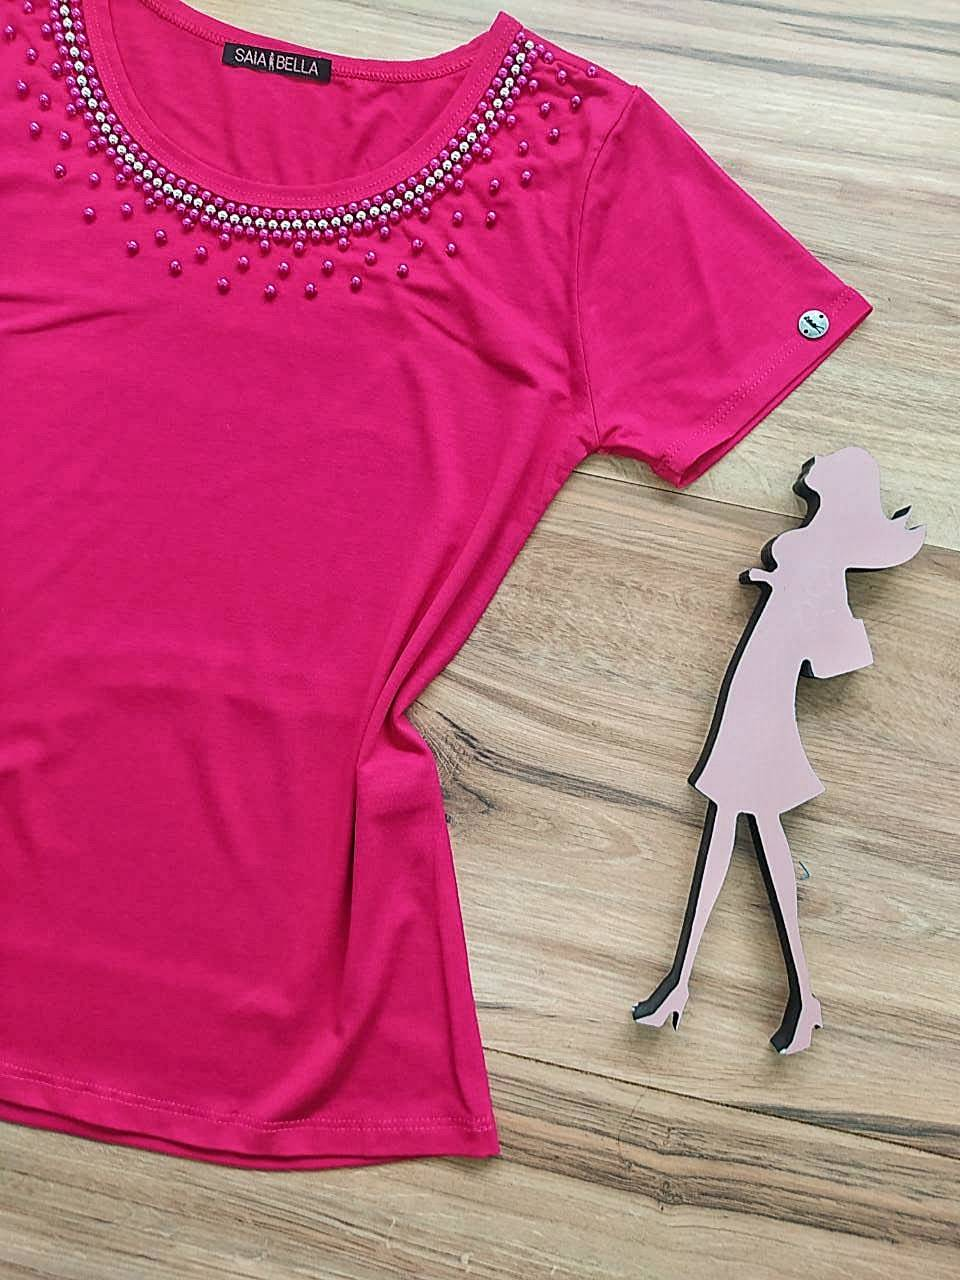 Blusa Rebeca 2.0 Saia Bella - SB41250 Pink